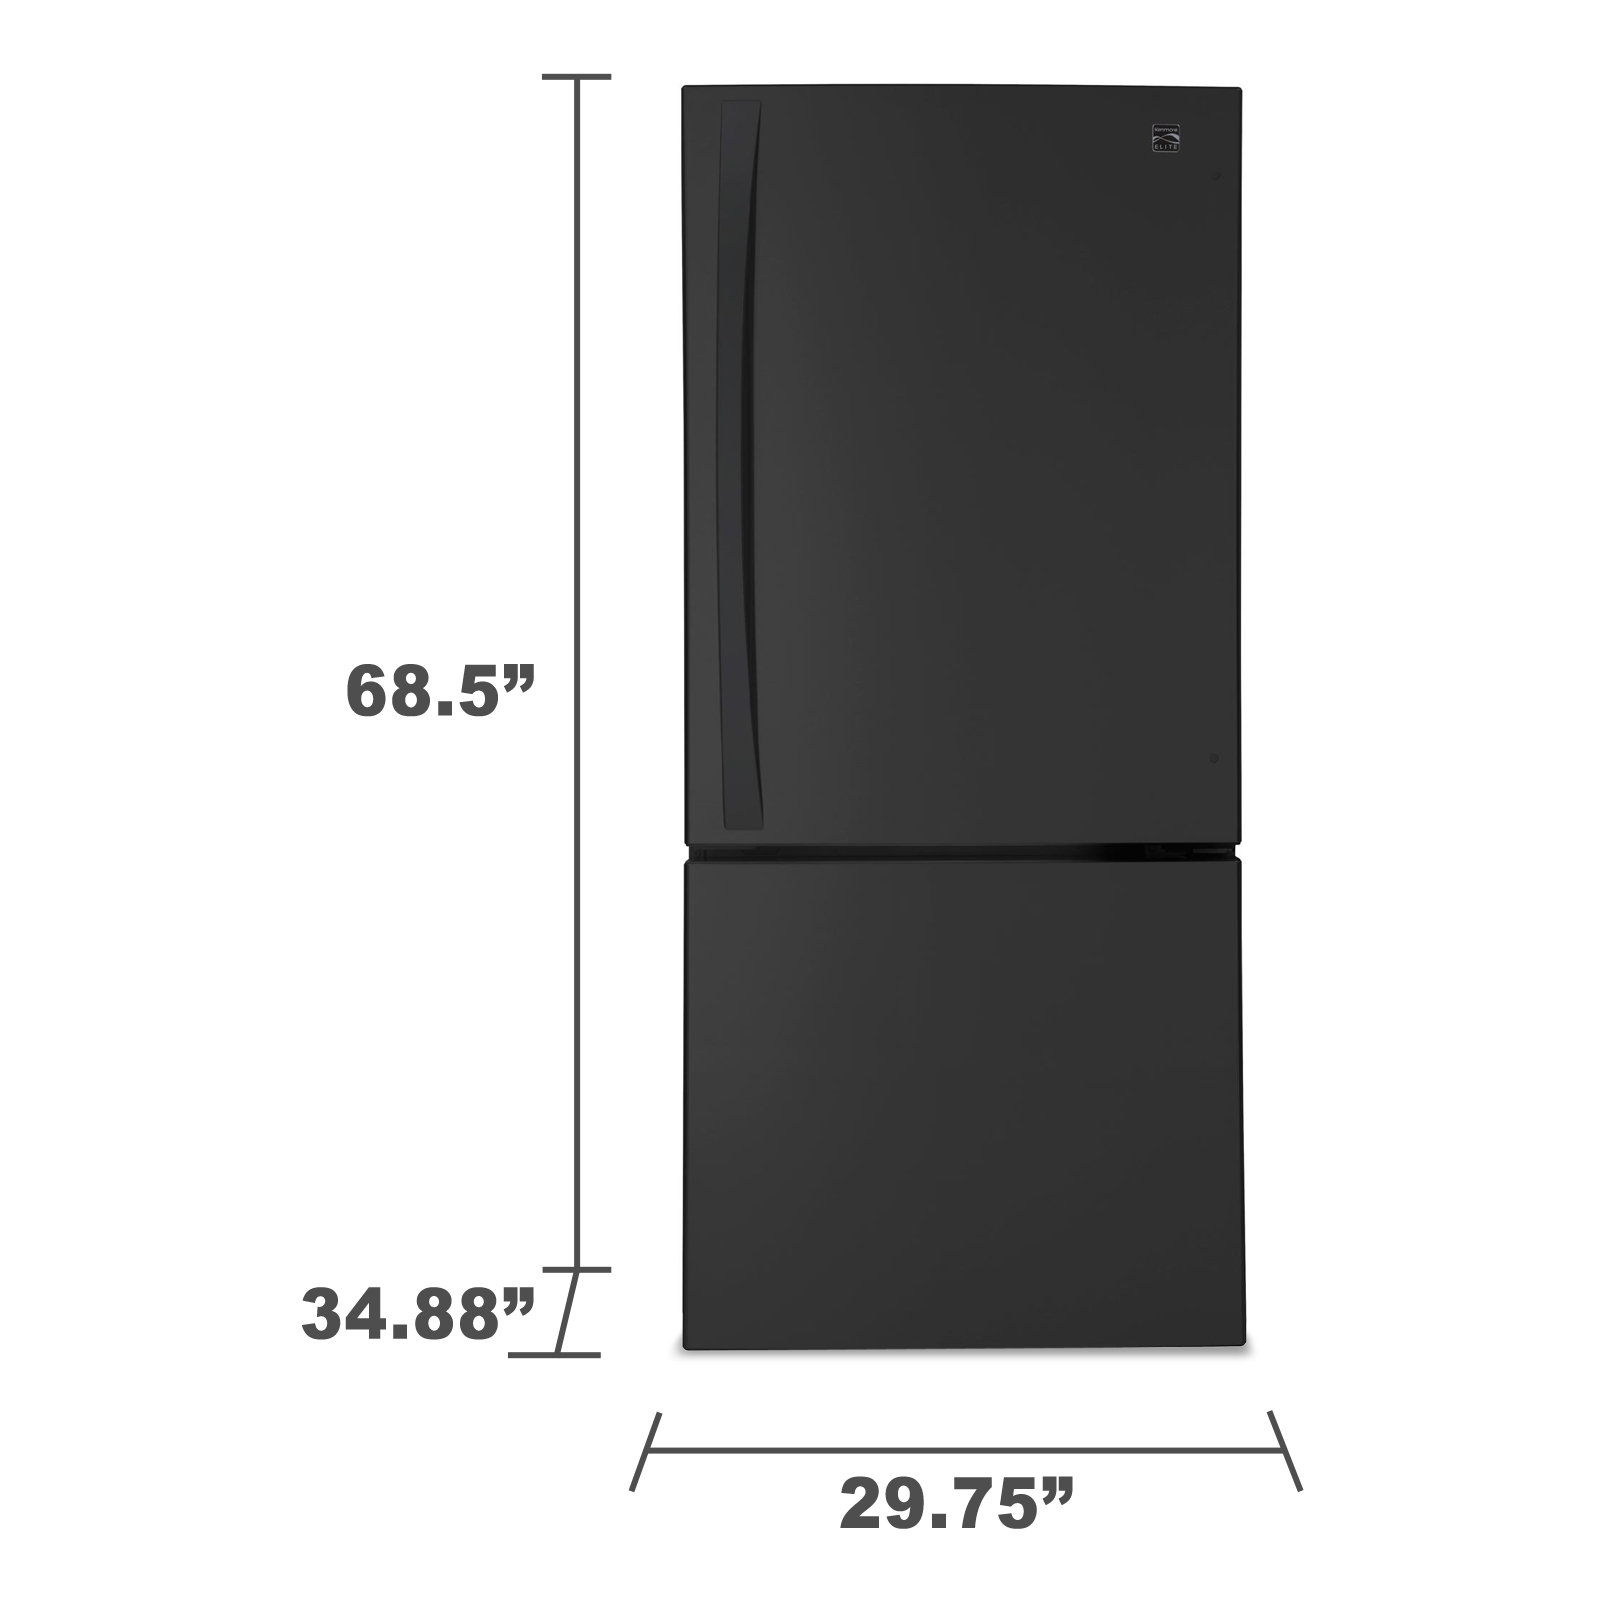 Kenmore Elite 22.1 cu. ft. Bottom-Freezer Refrigerator - Black